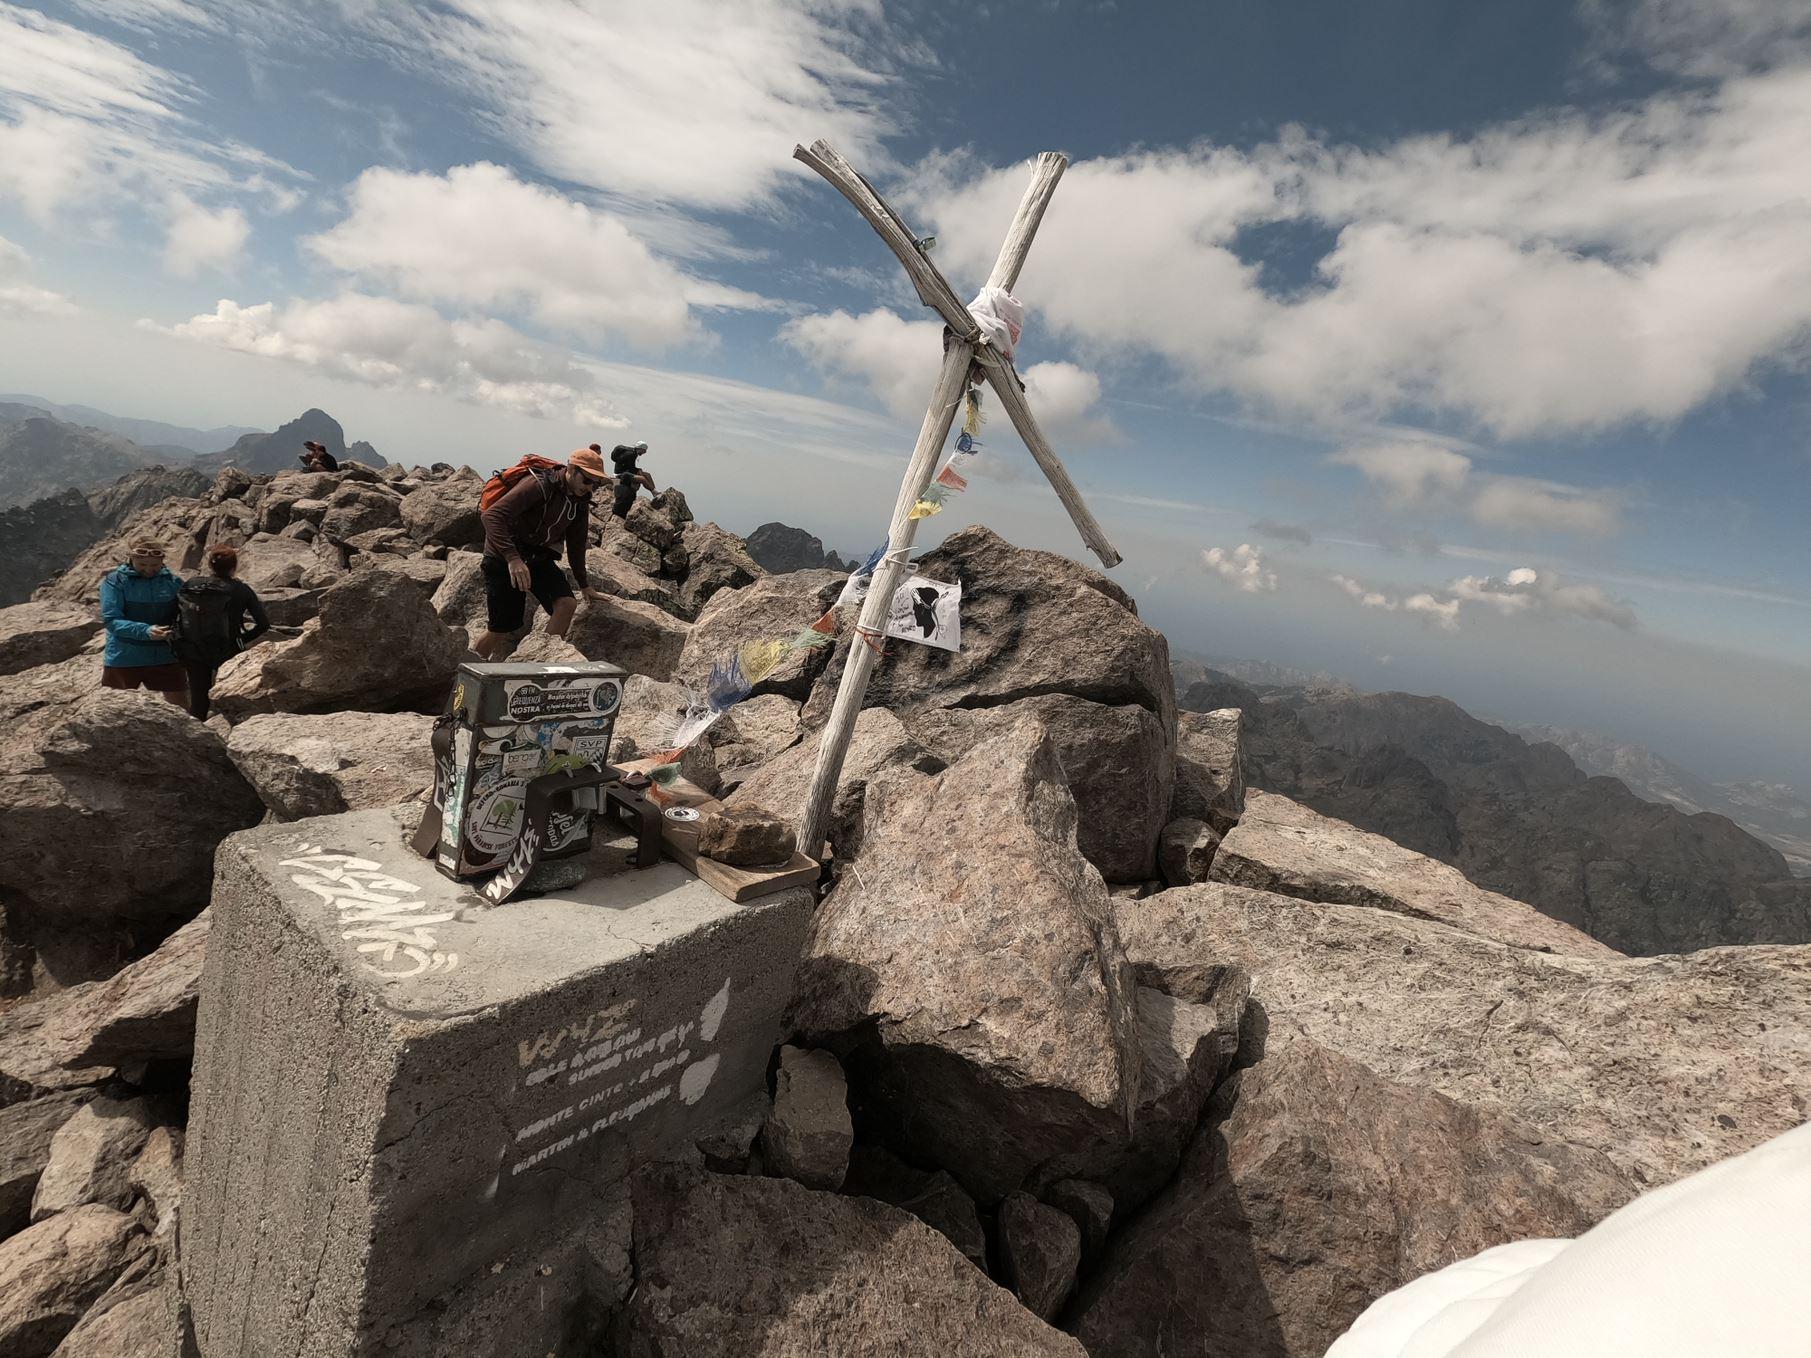 sommet monte cinto GR20 corse nord montagne